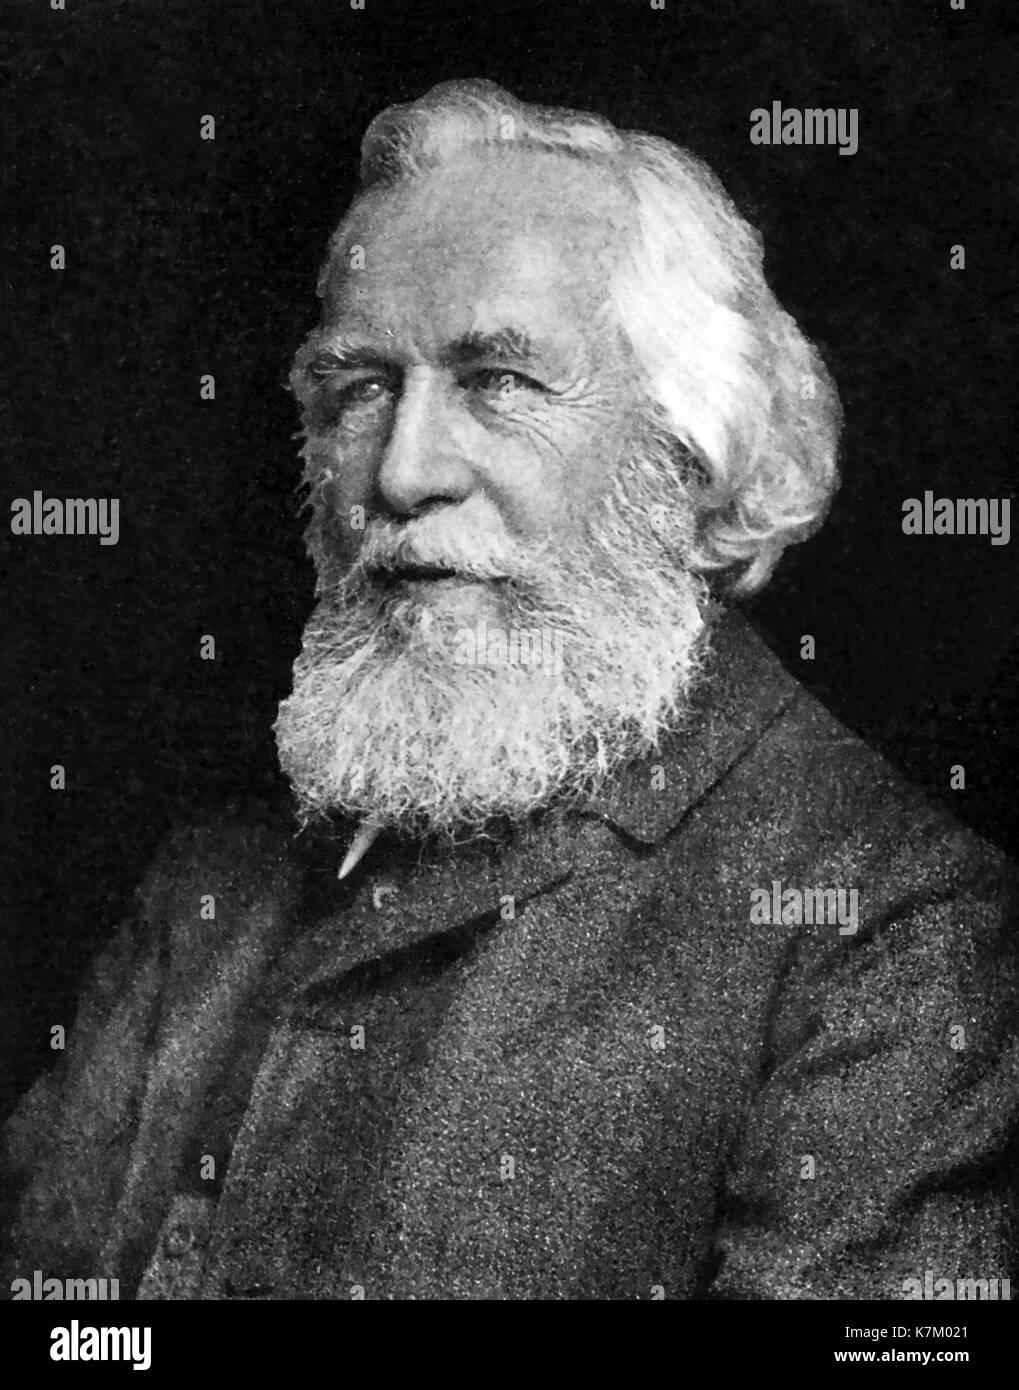 ERNST HAECKEL (1834-1919) German biologist, physician,naturalist - Stock Image